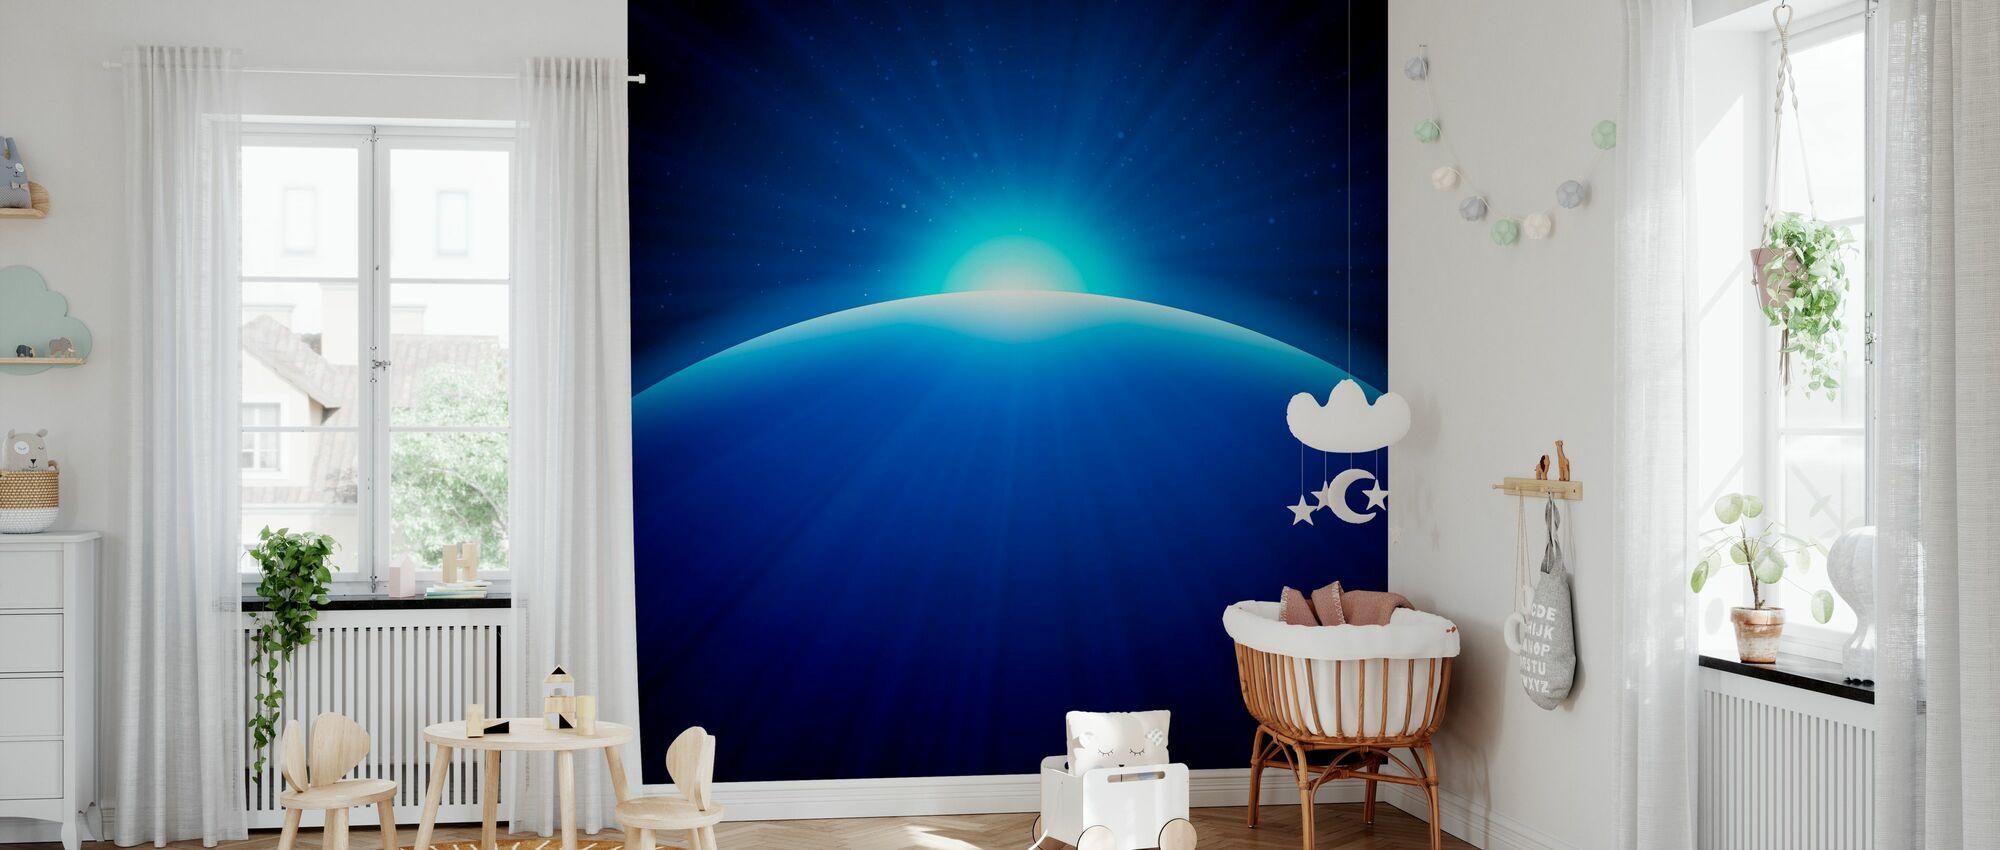 Global Edge Sunrise - Wallpaper - Nursery